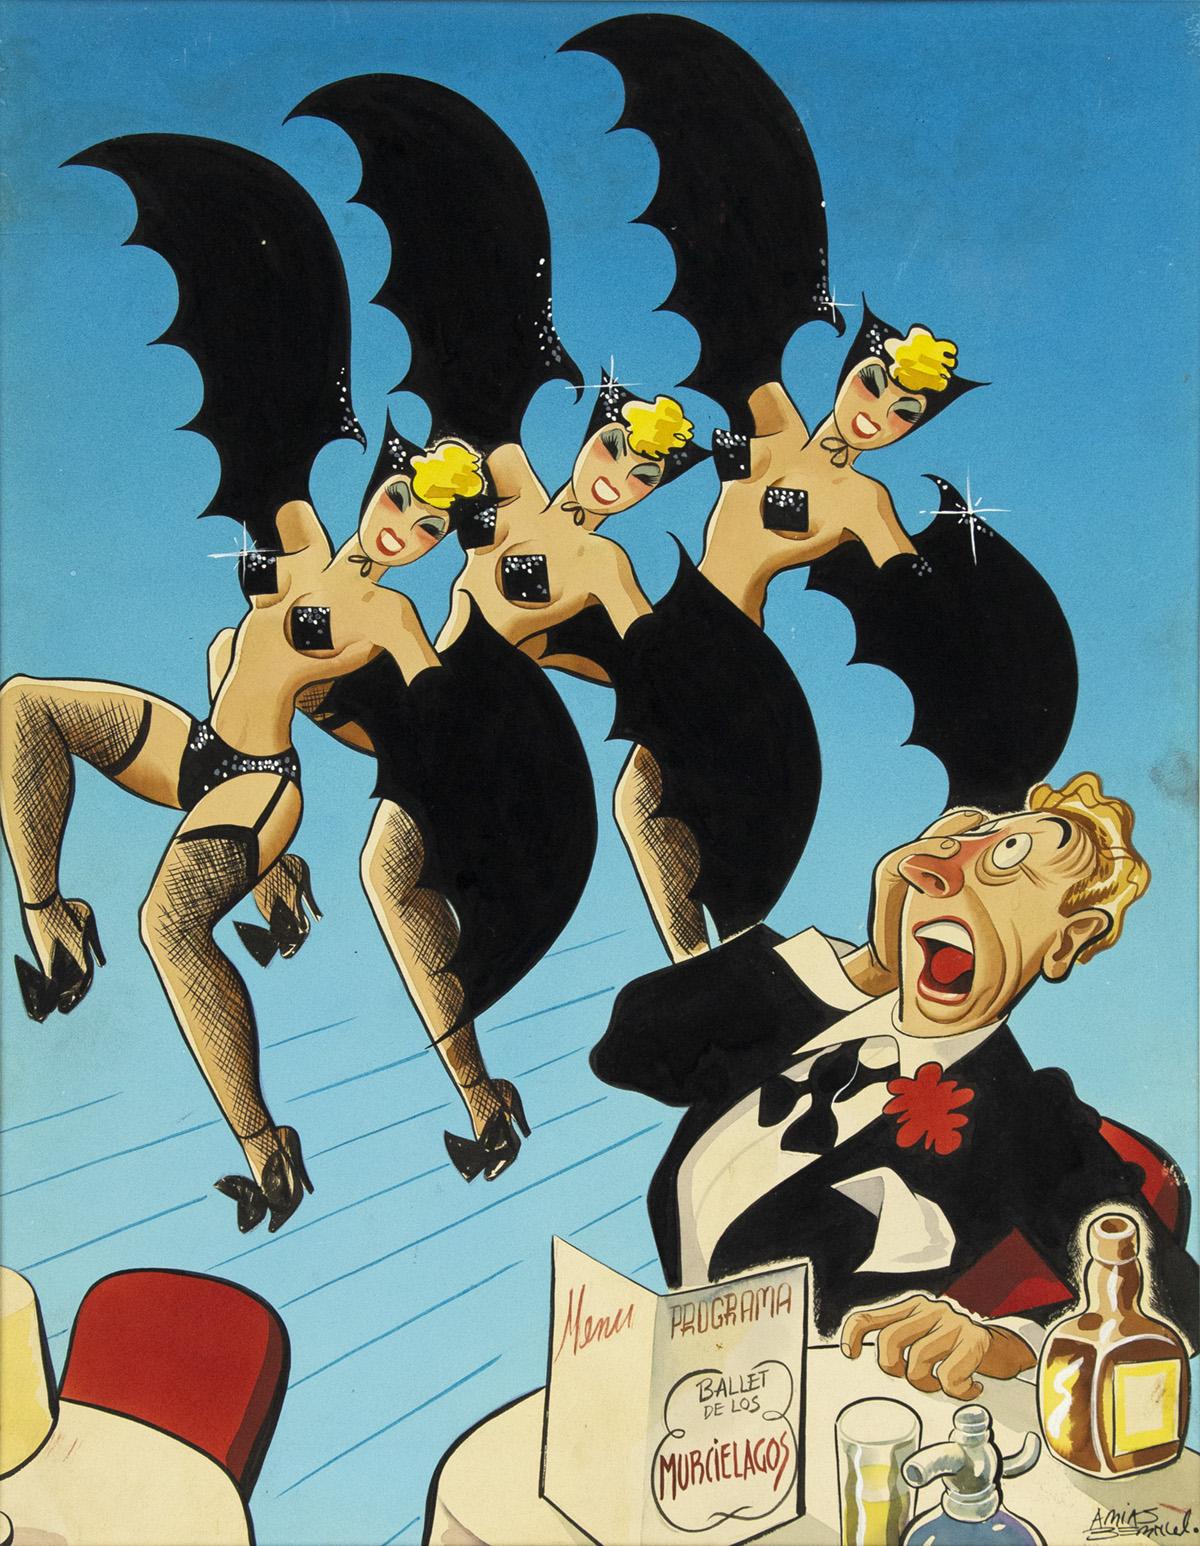 (ANTONIO) ARIAS BERNAL. Ballet de los Murciélagos. (Bat Ballet.) [LATIN AMERICAN / COVER ART / MEXICO CITY]